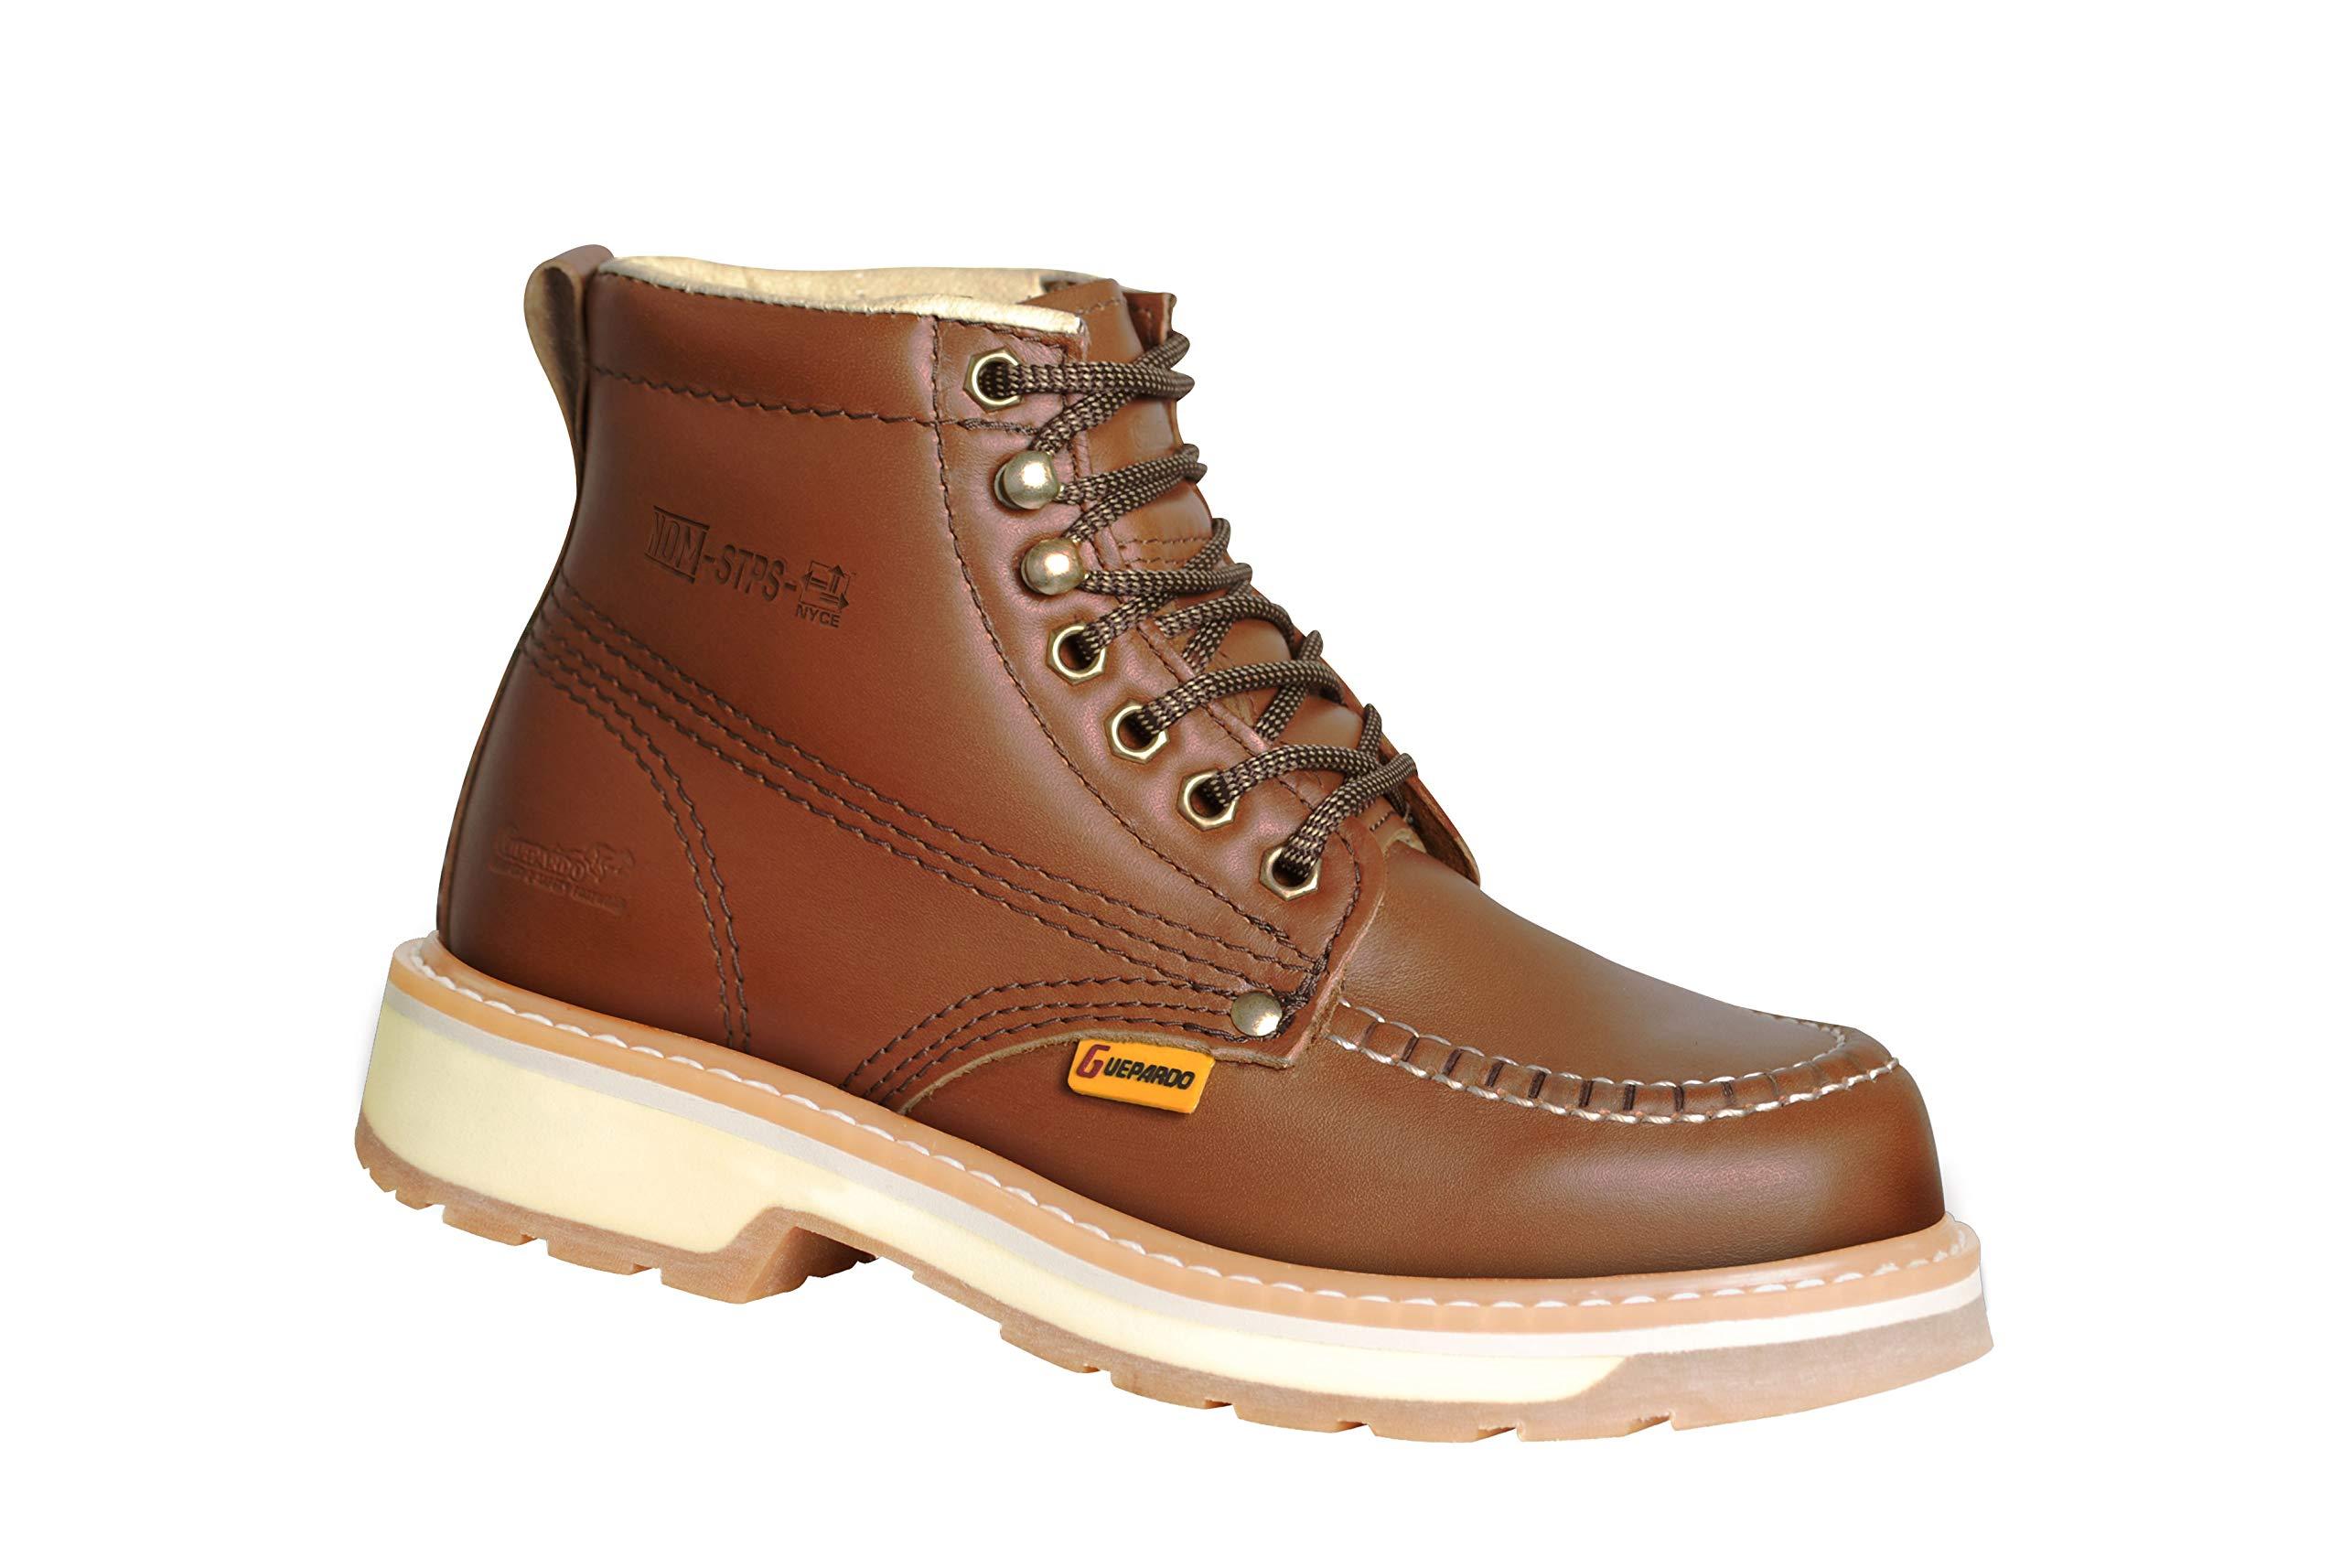 Guepardo Safety Footwear Model GHWM25S/DUAL (Modern Work Boots) (8) Cinnamon